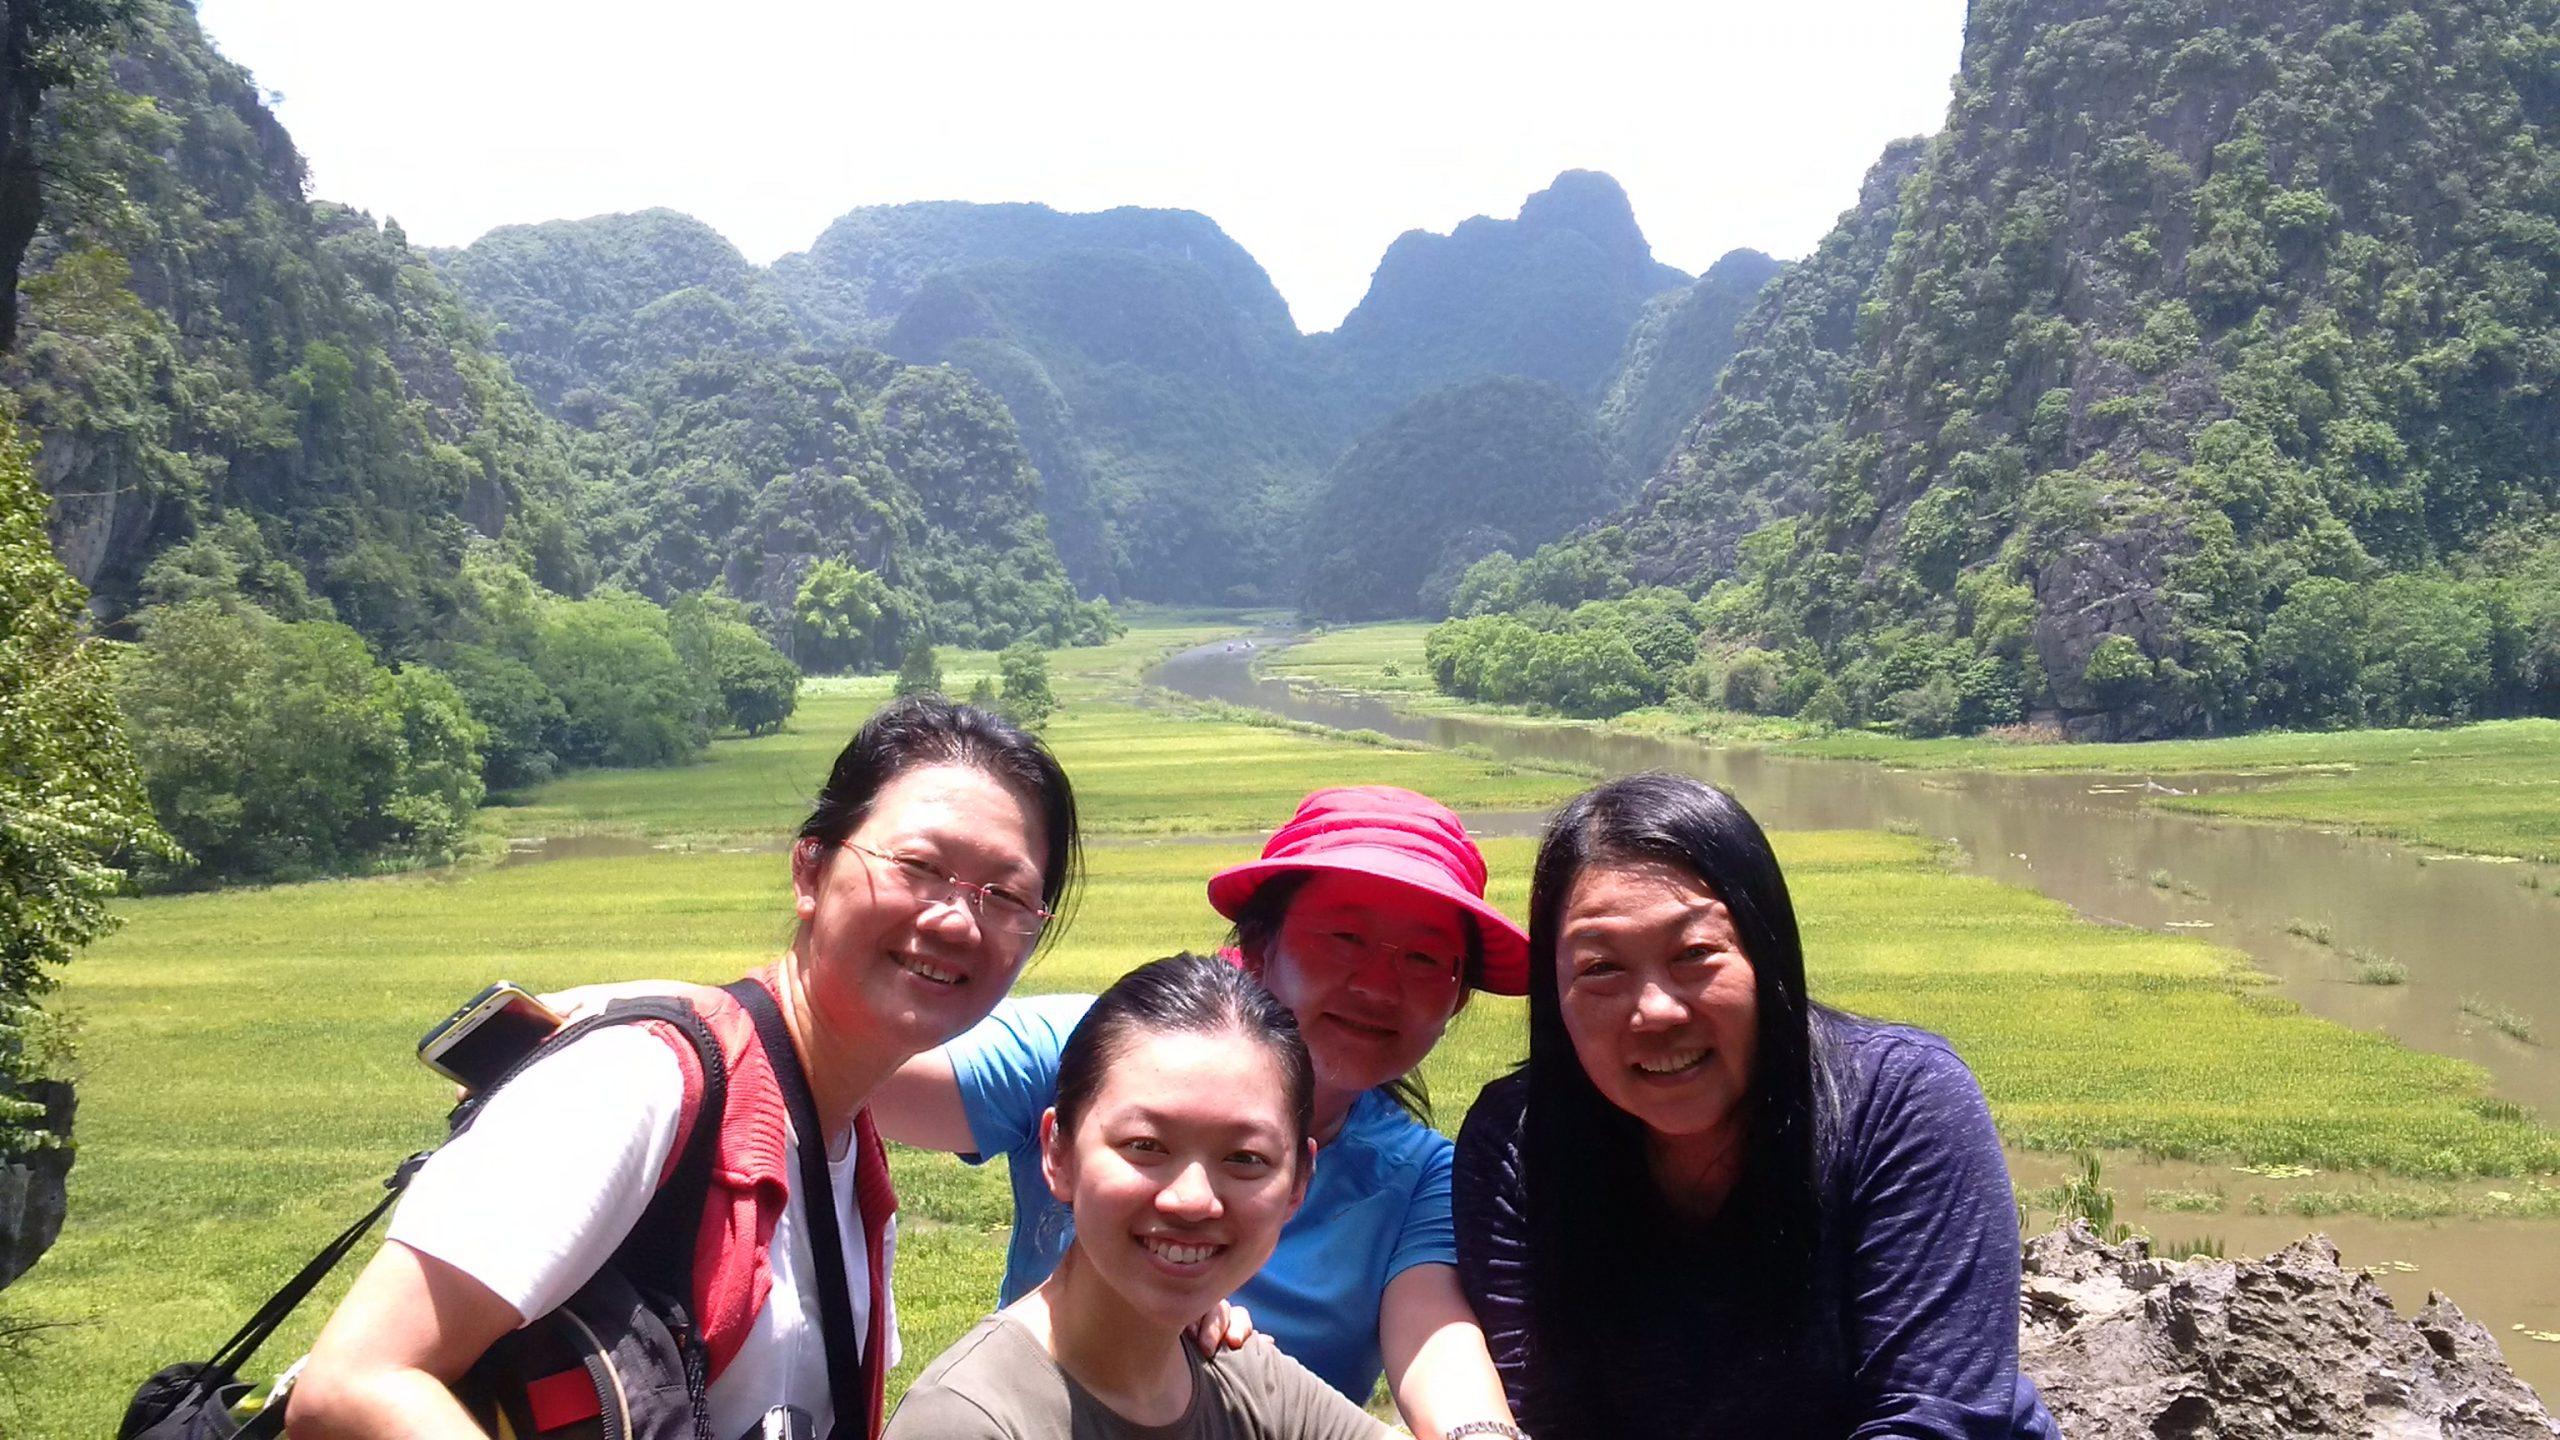 tony vietnam adventures on tour with locals